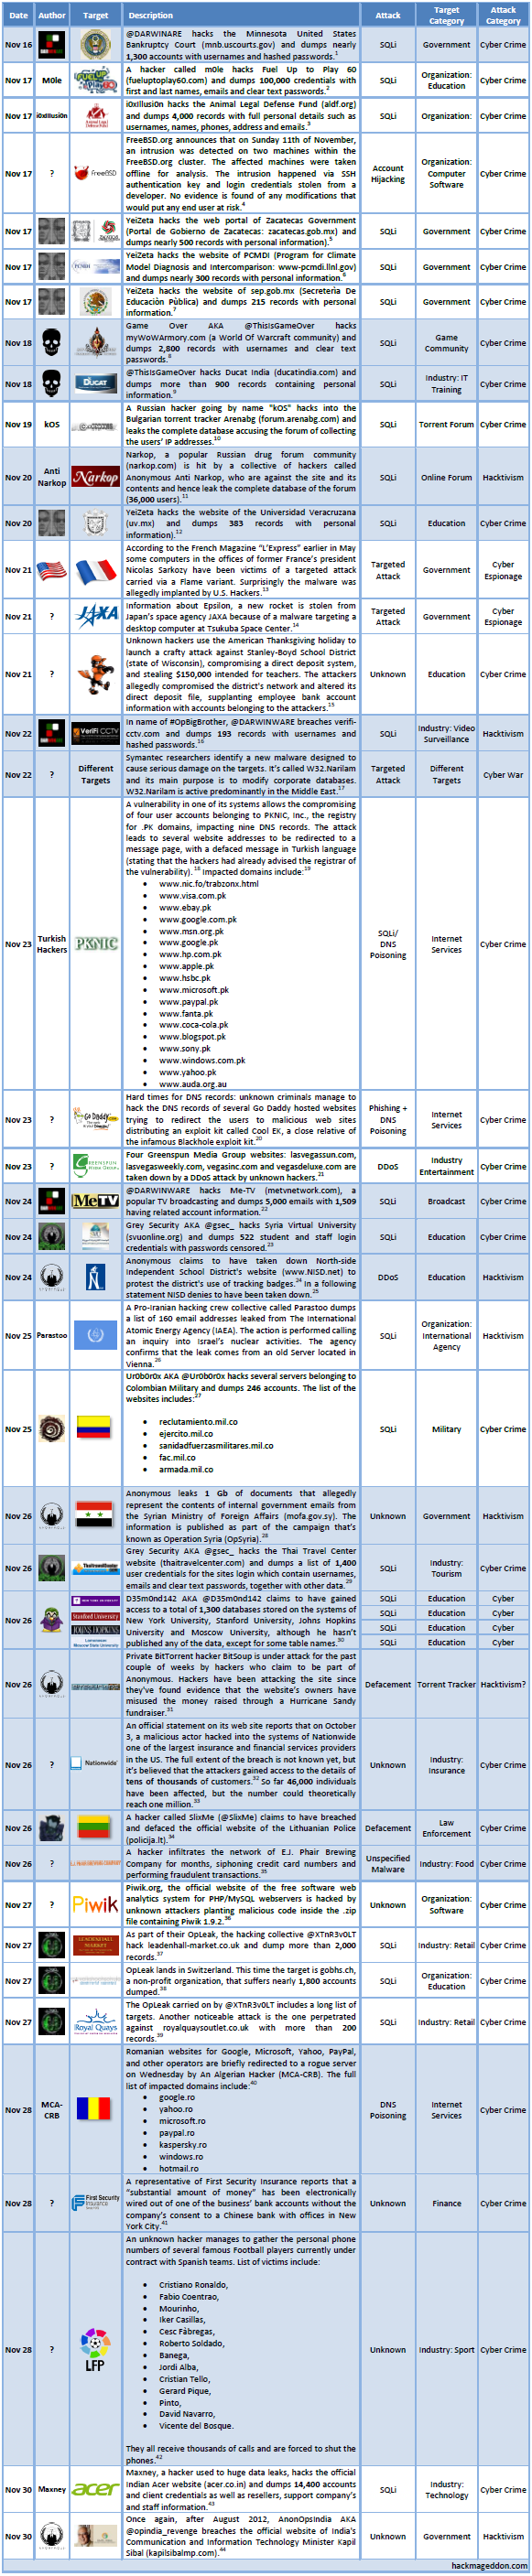 16-30 November 2012 Cyber Attacks Timeline